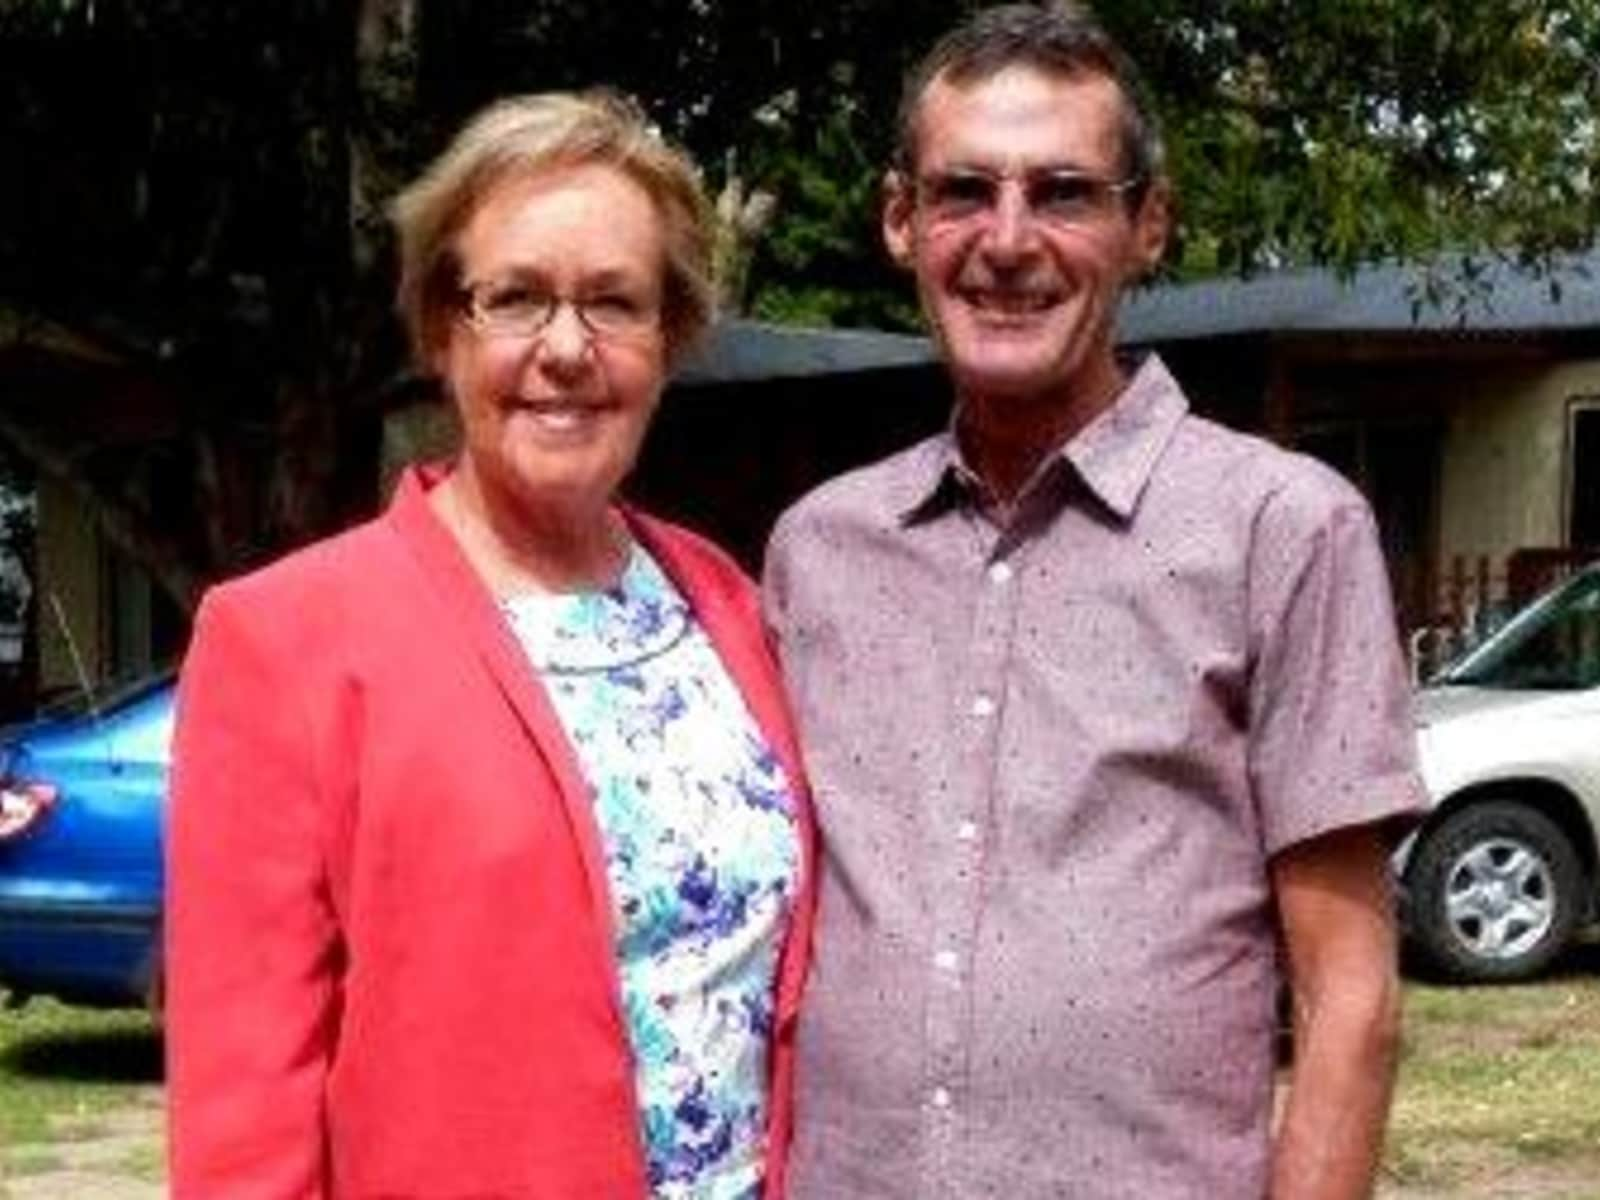 Lorraine & Ian from Geelong, Victoria, Australia